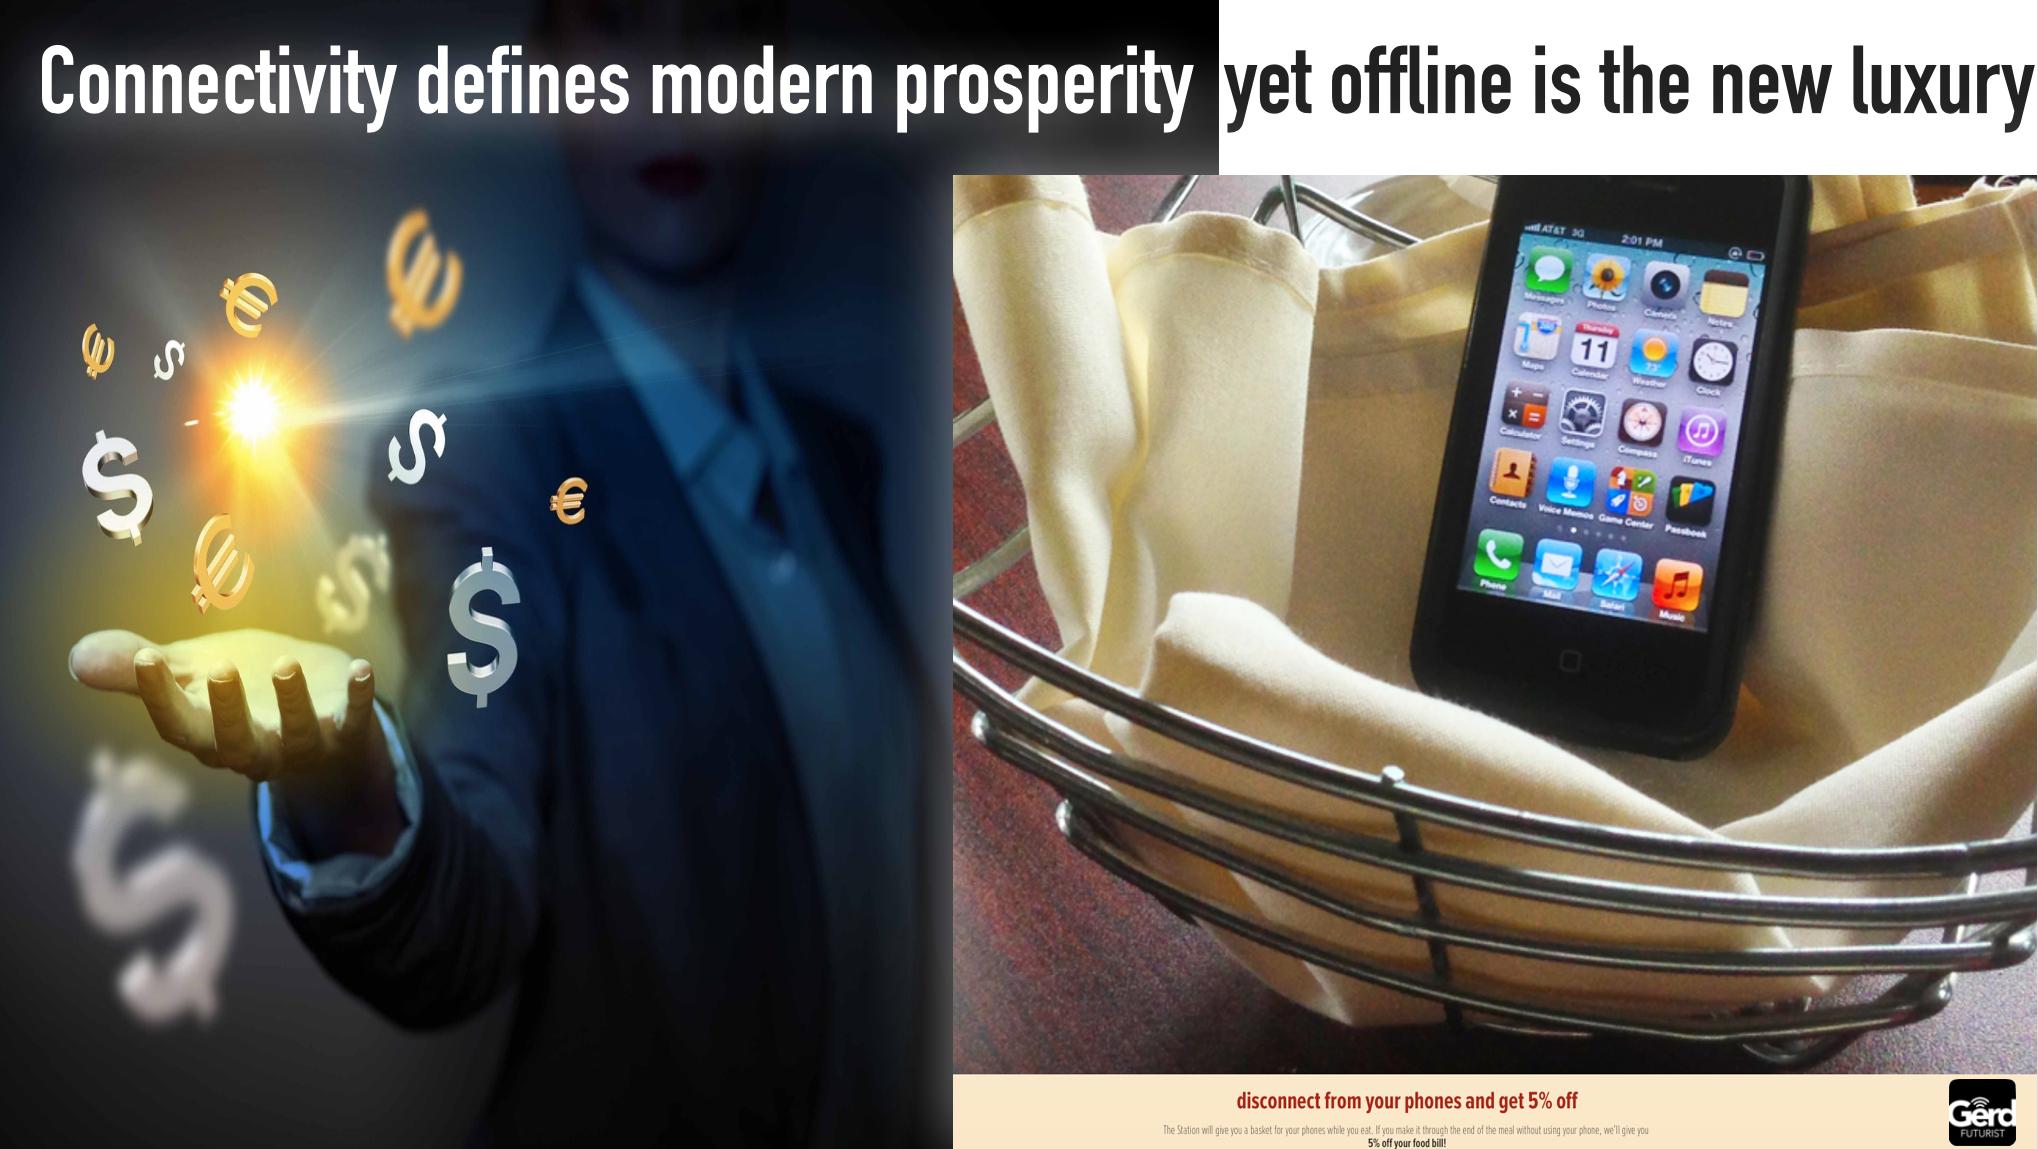 connectivity prosperity offline luxury gerd leonhard